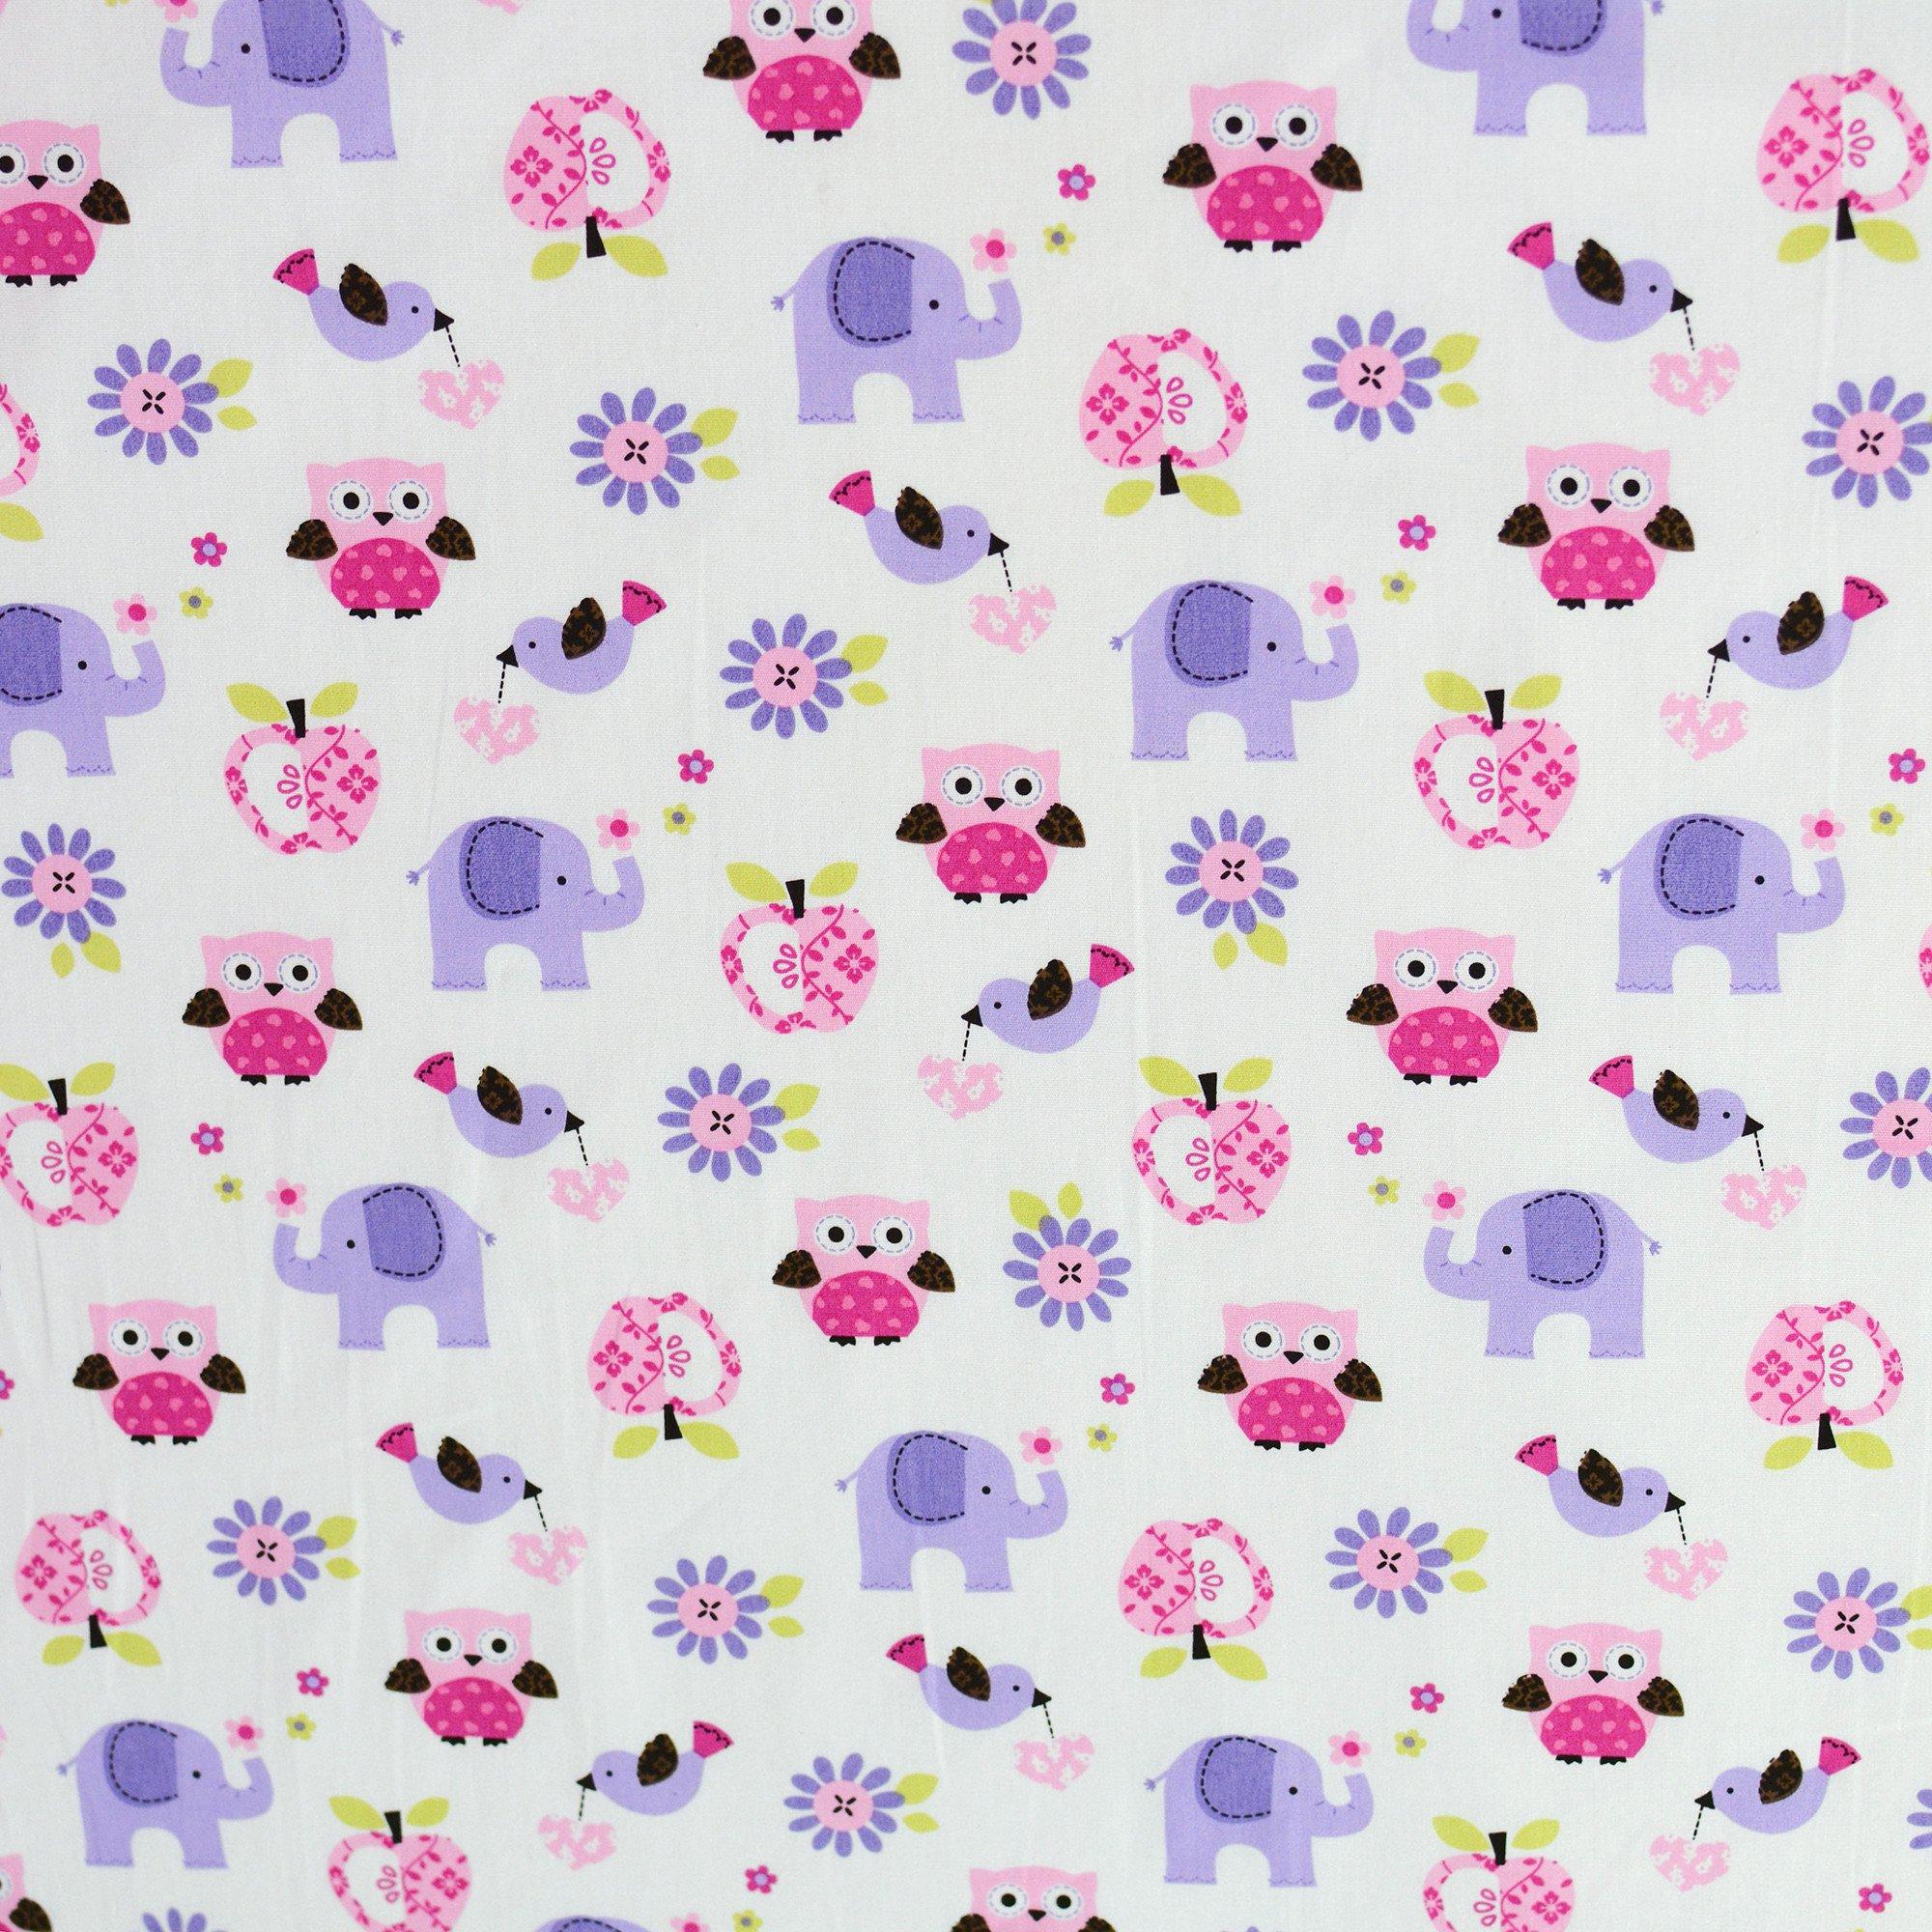 Brandream Crib Bedding Sets For Girls With Bumper Purple Owl And Elephant Nursery Bedding Set ,8pcs